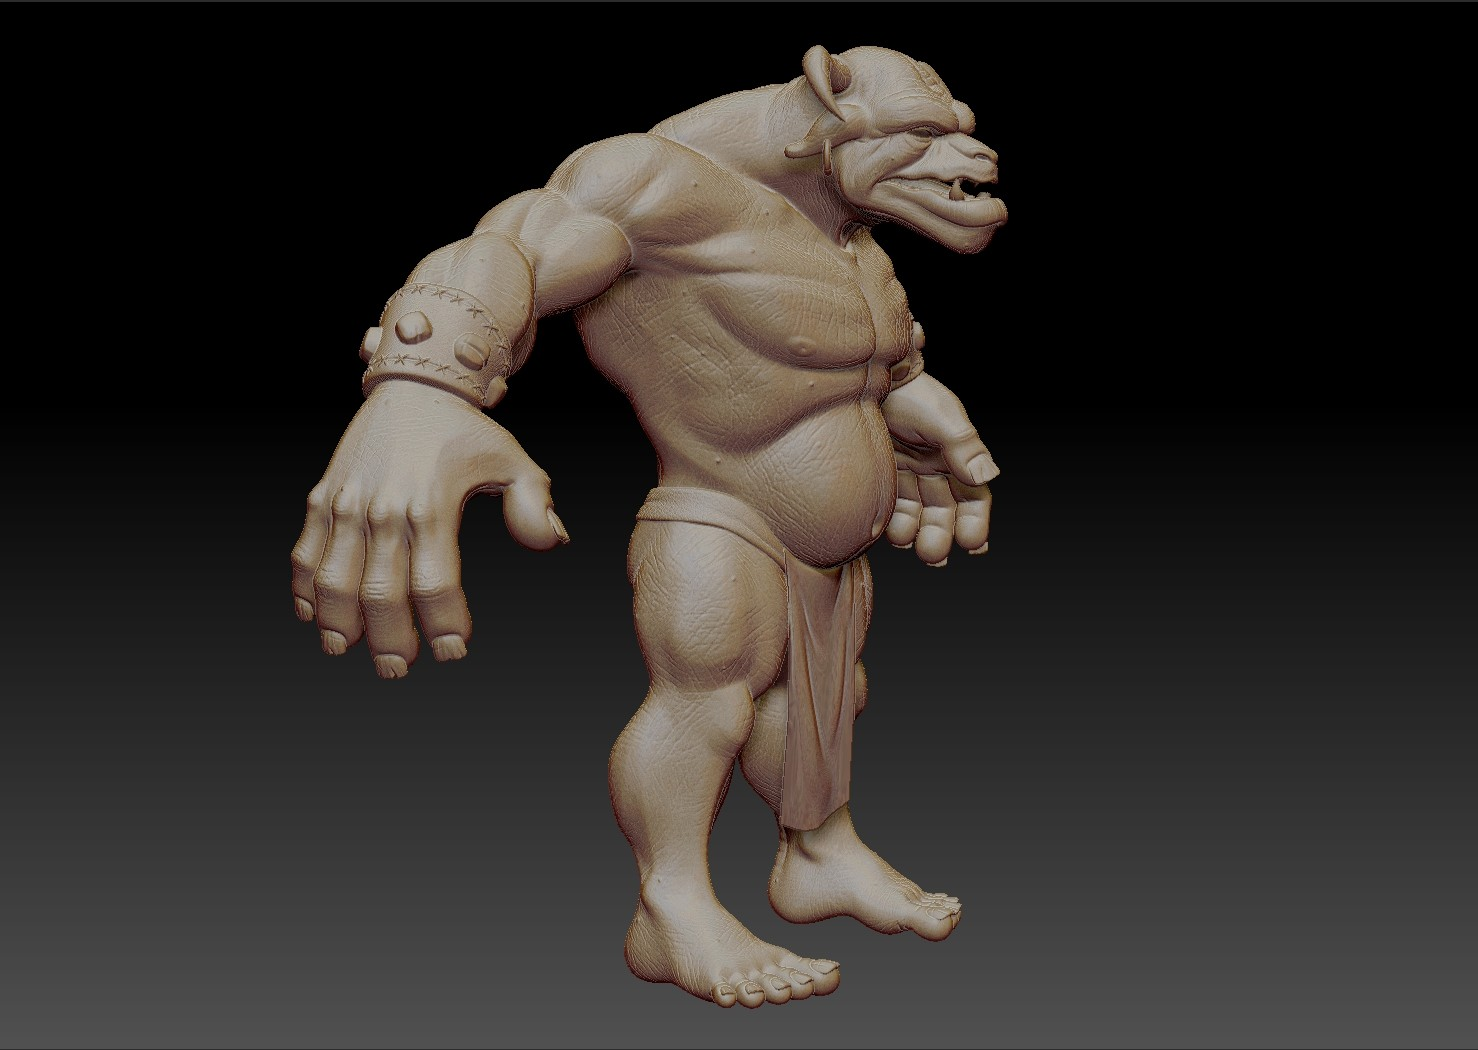 Bronn - Zbrush Sculpt